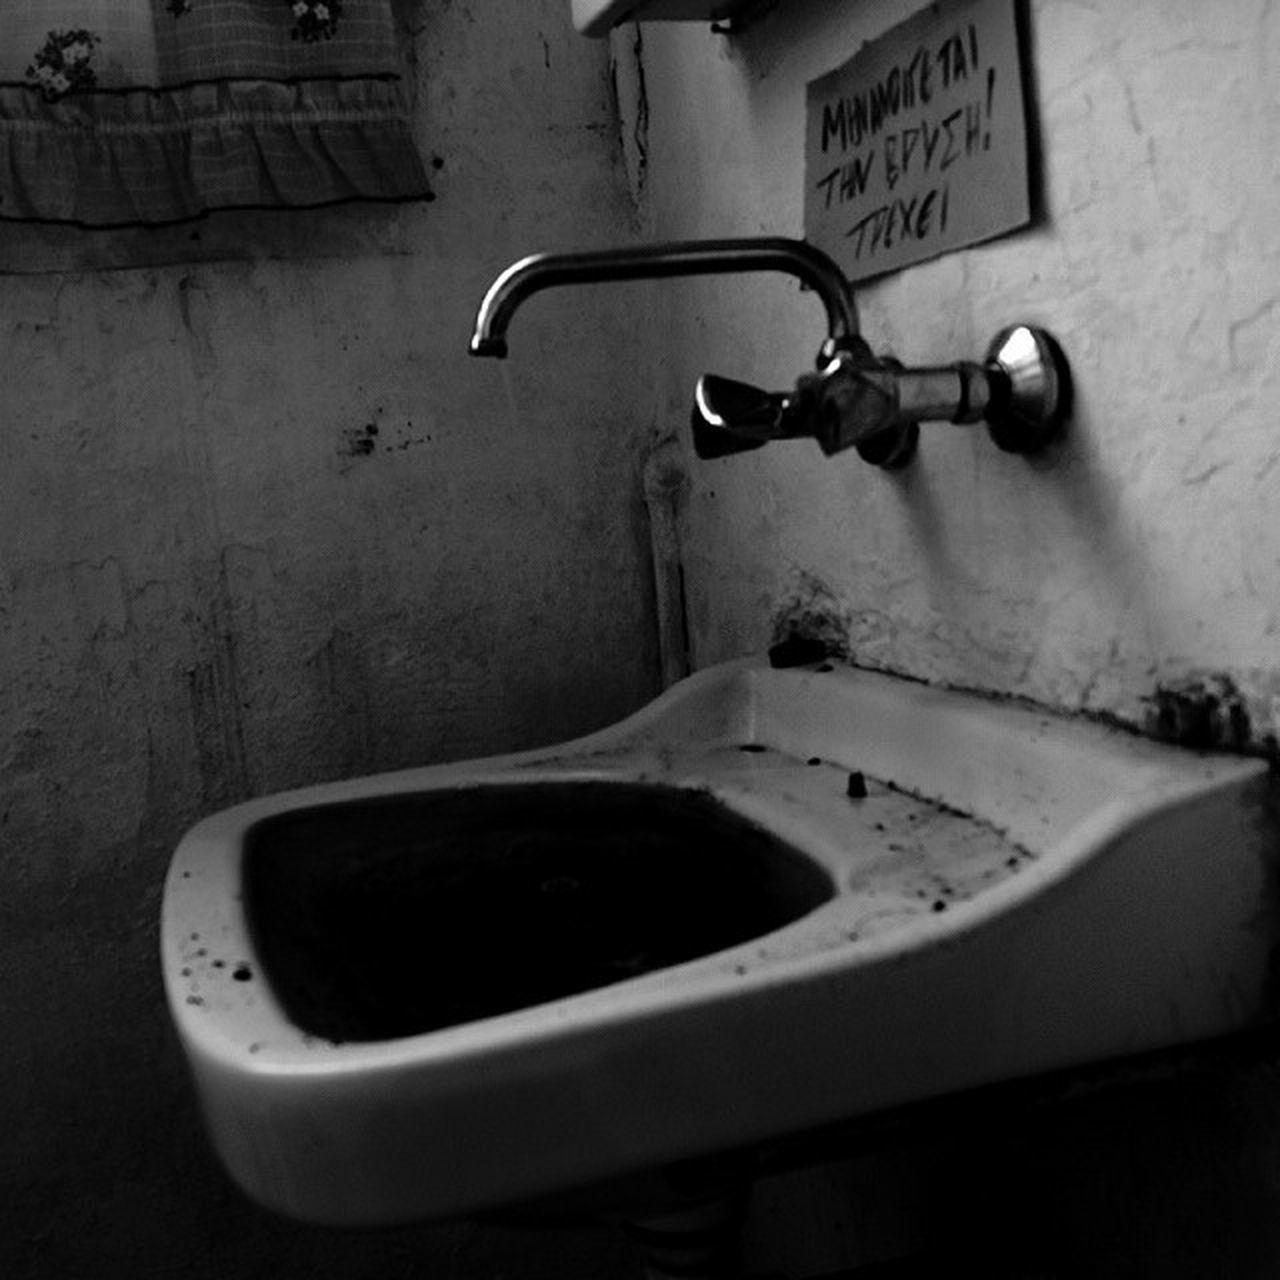 bathroom, indoors, domestic bathroom, no people, domestic room, faucet, day, close-up, bathroom sink, toilet bowl